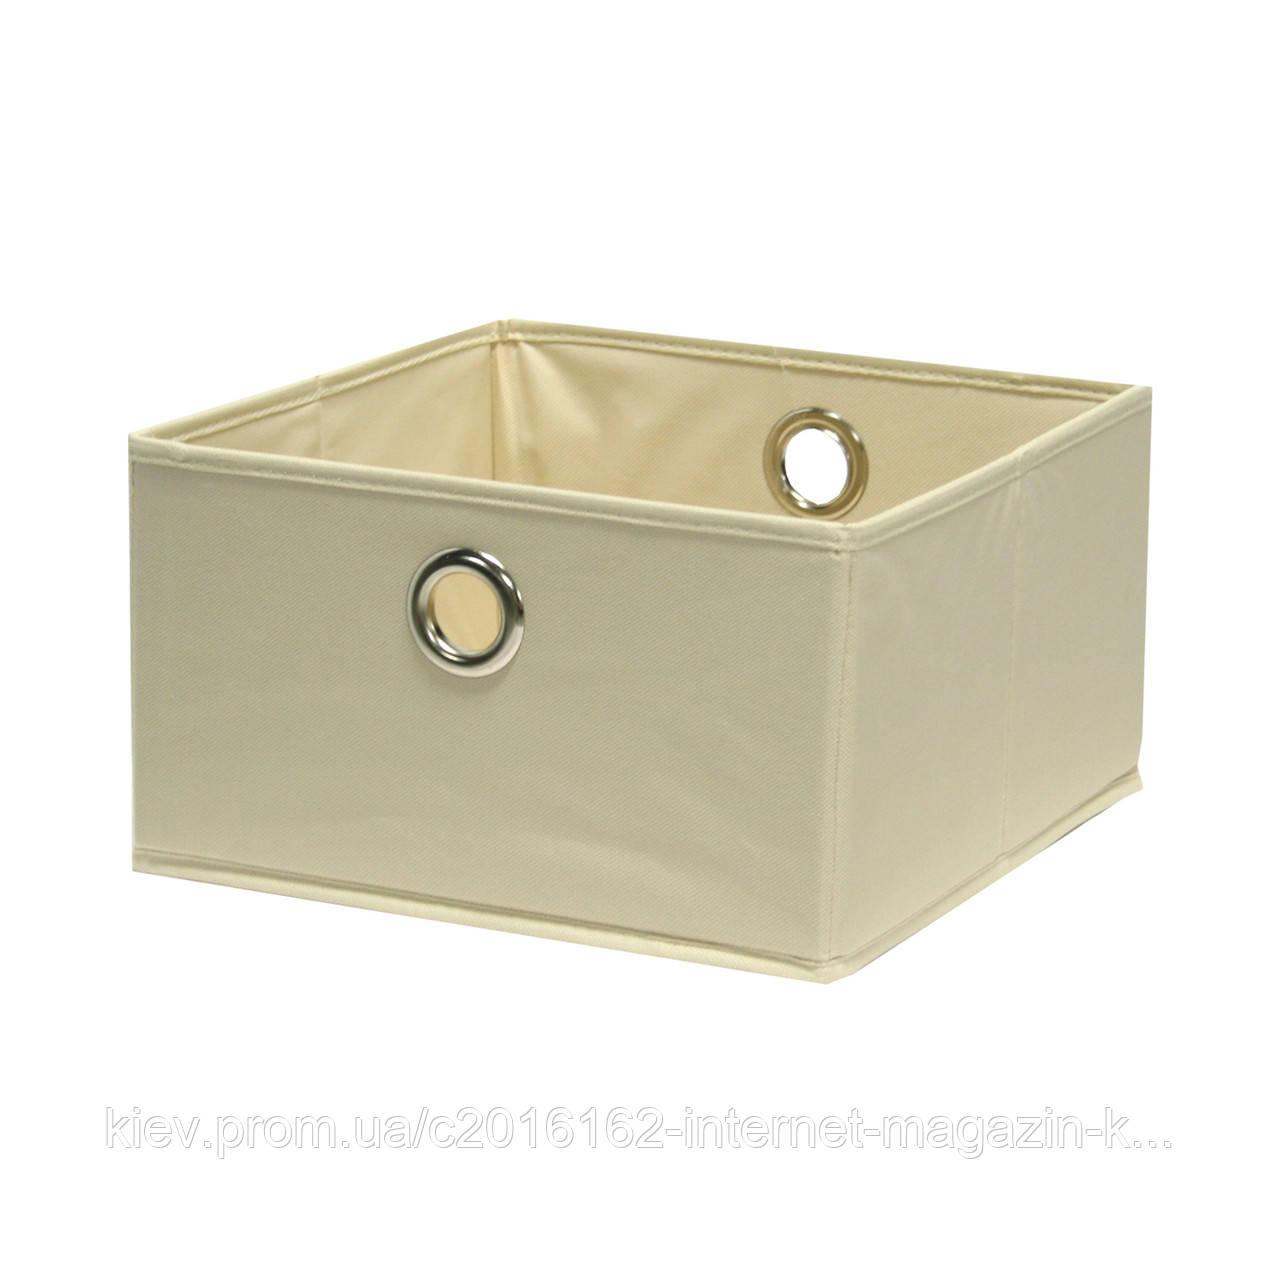 Корзина для белья Home4You Basket 30x30xH17cm  beige